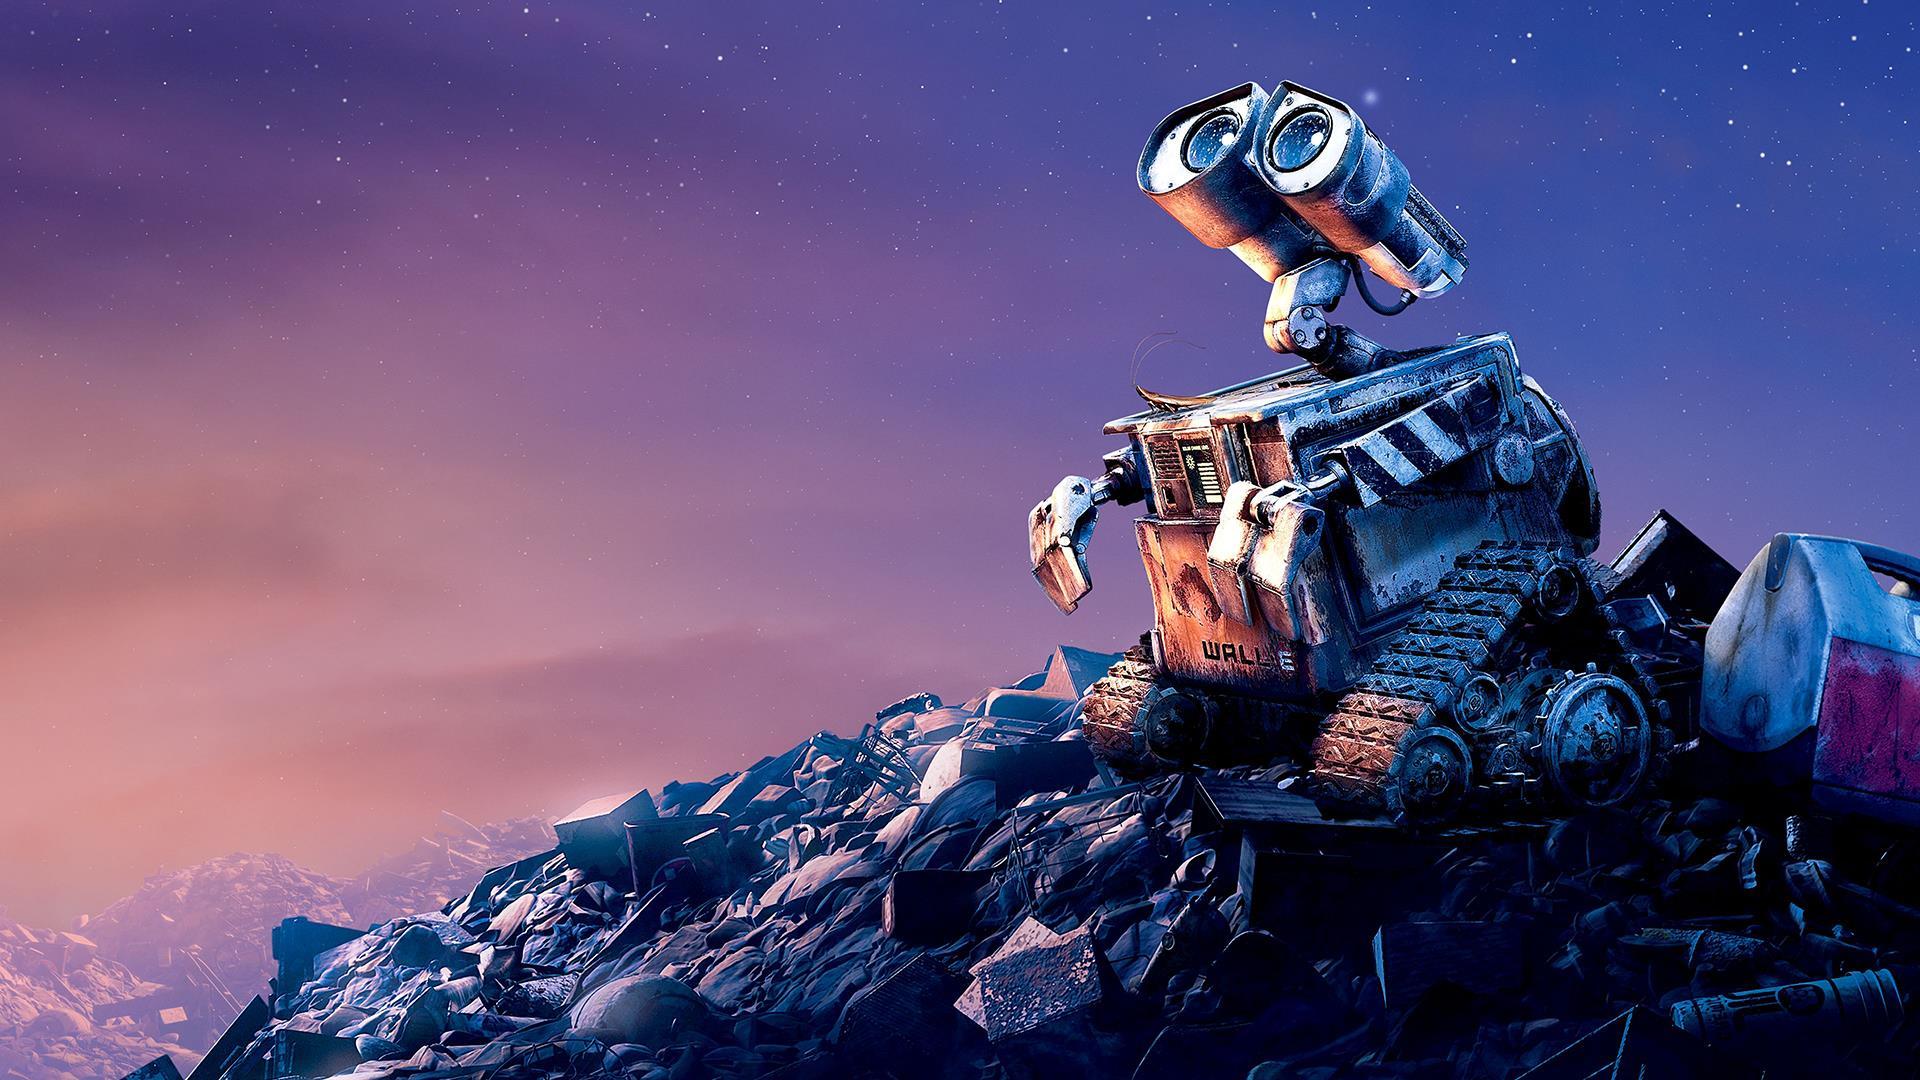 Filmklubb: WALL-E